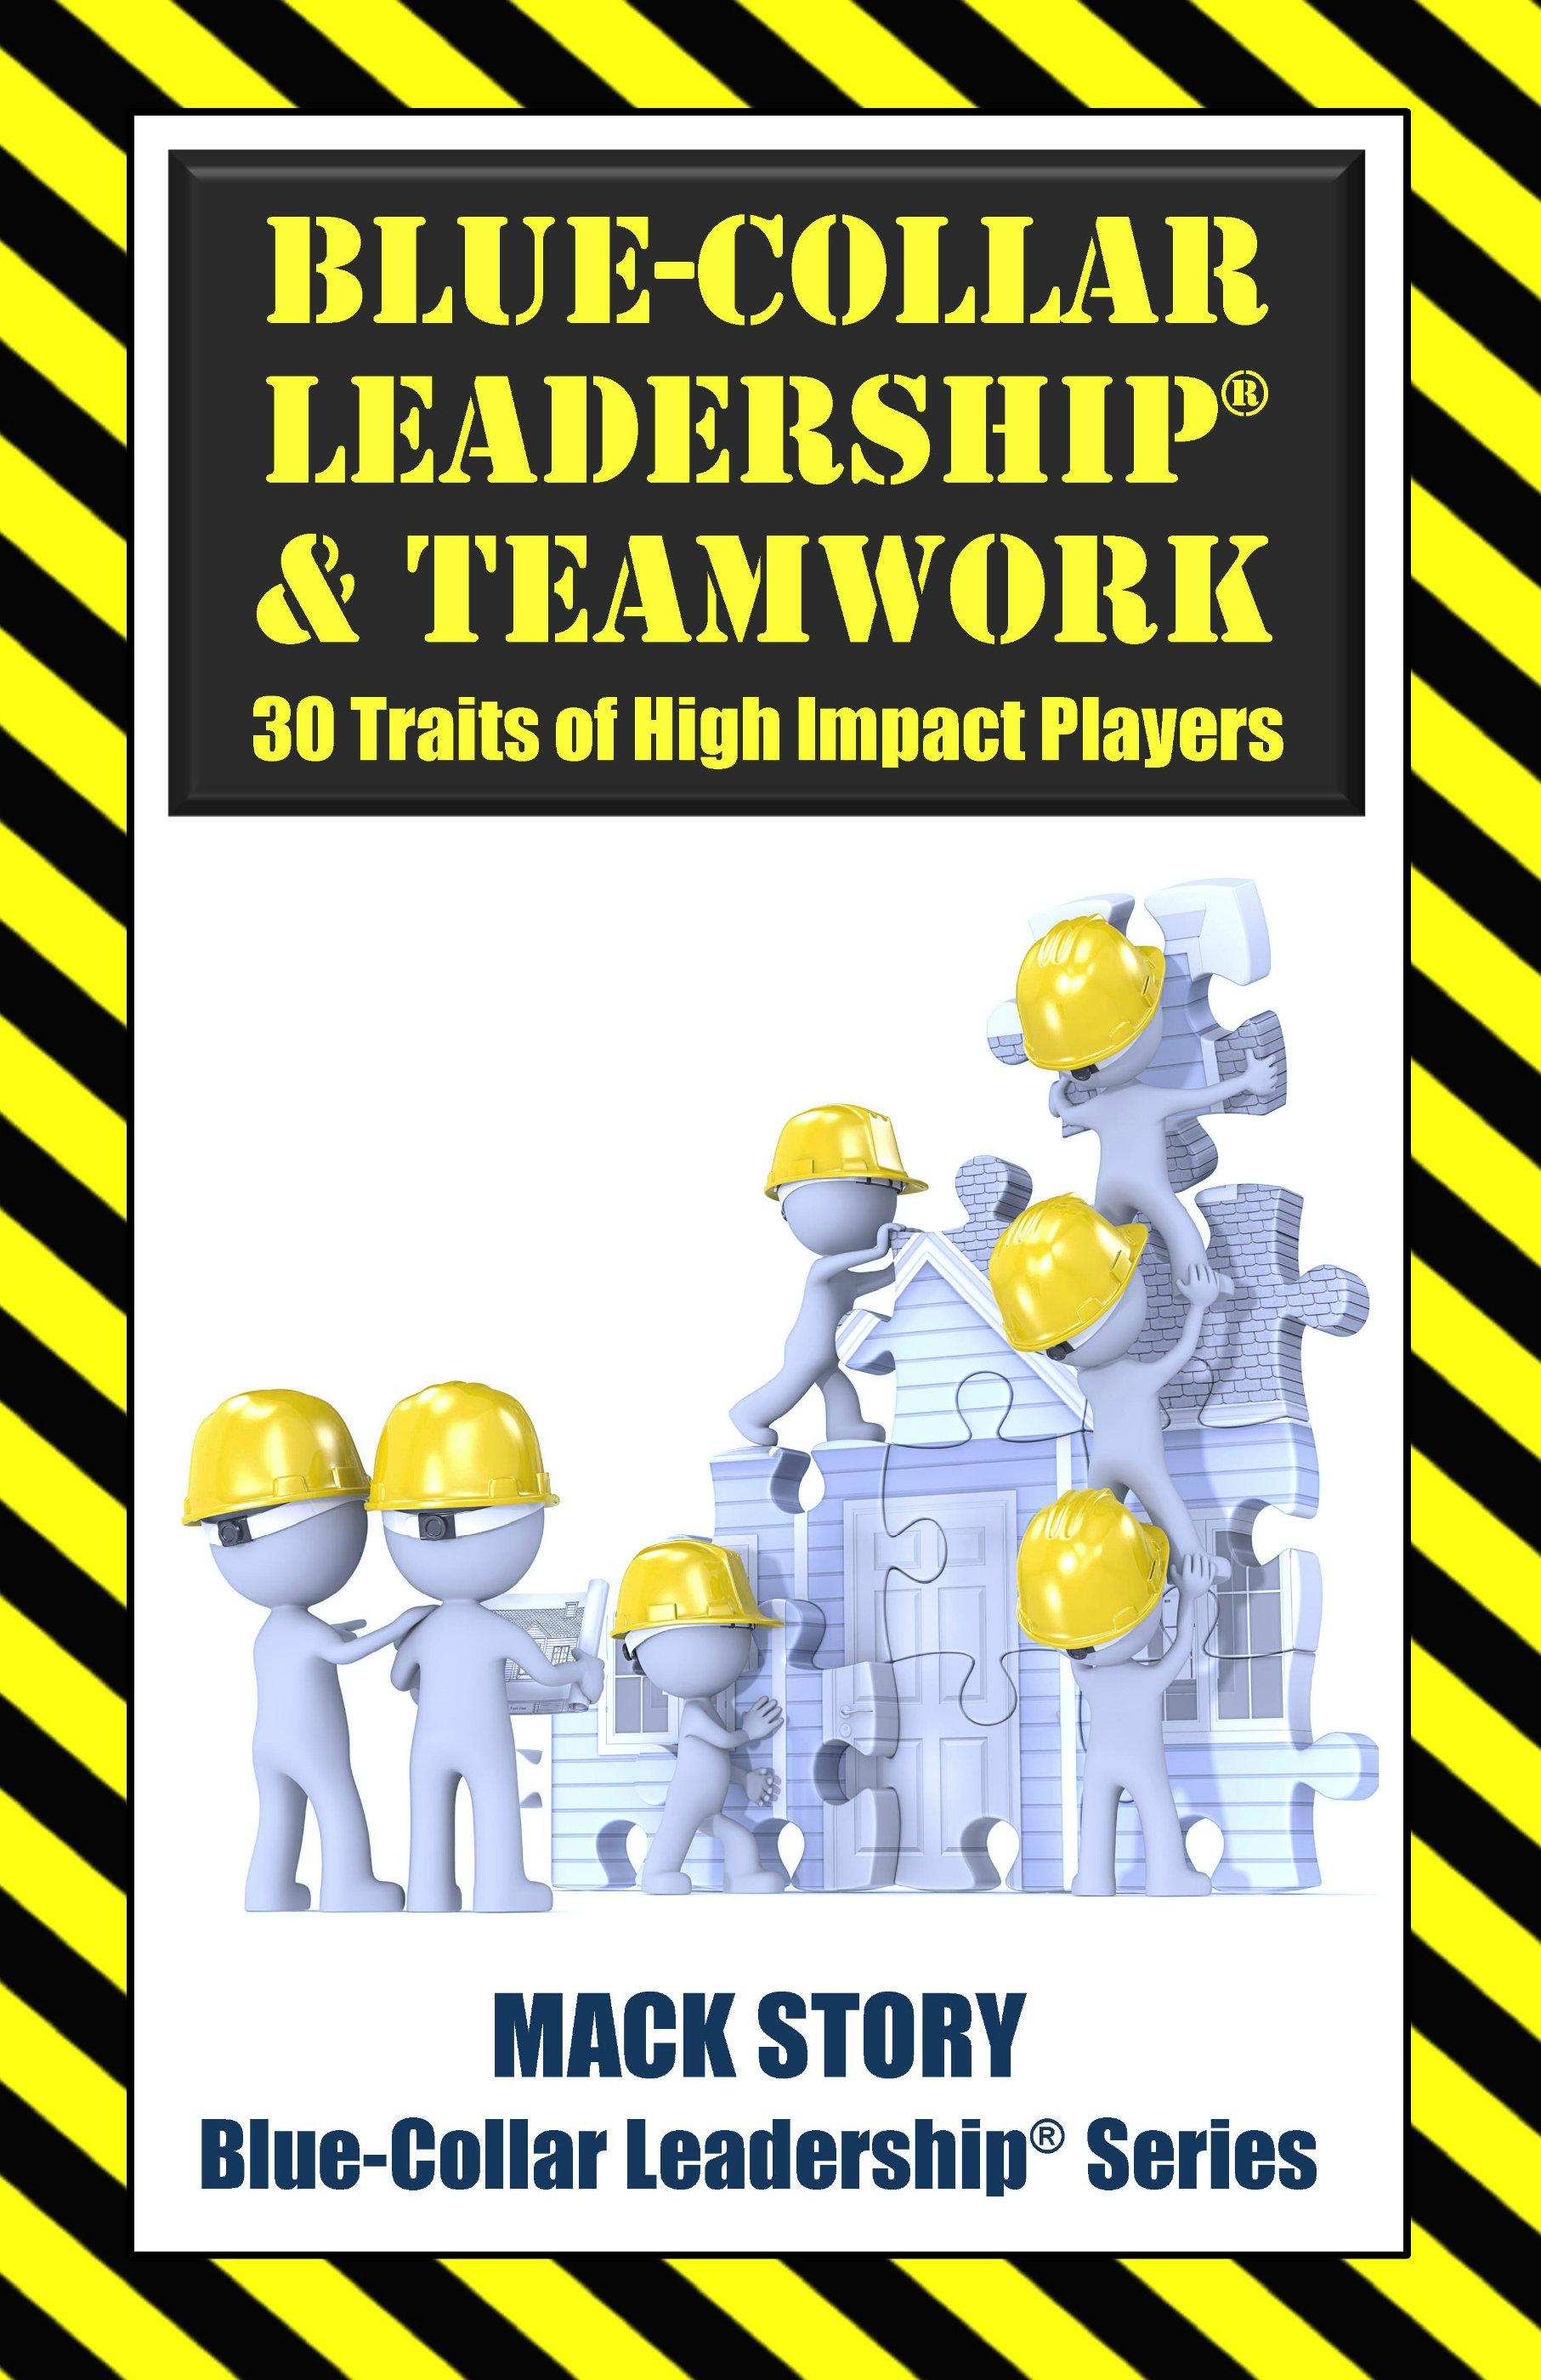 Blue-Collar Leadership & Teamwork 00009